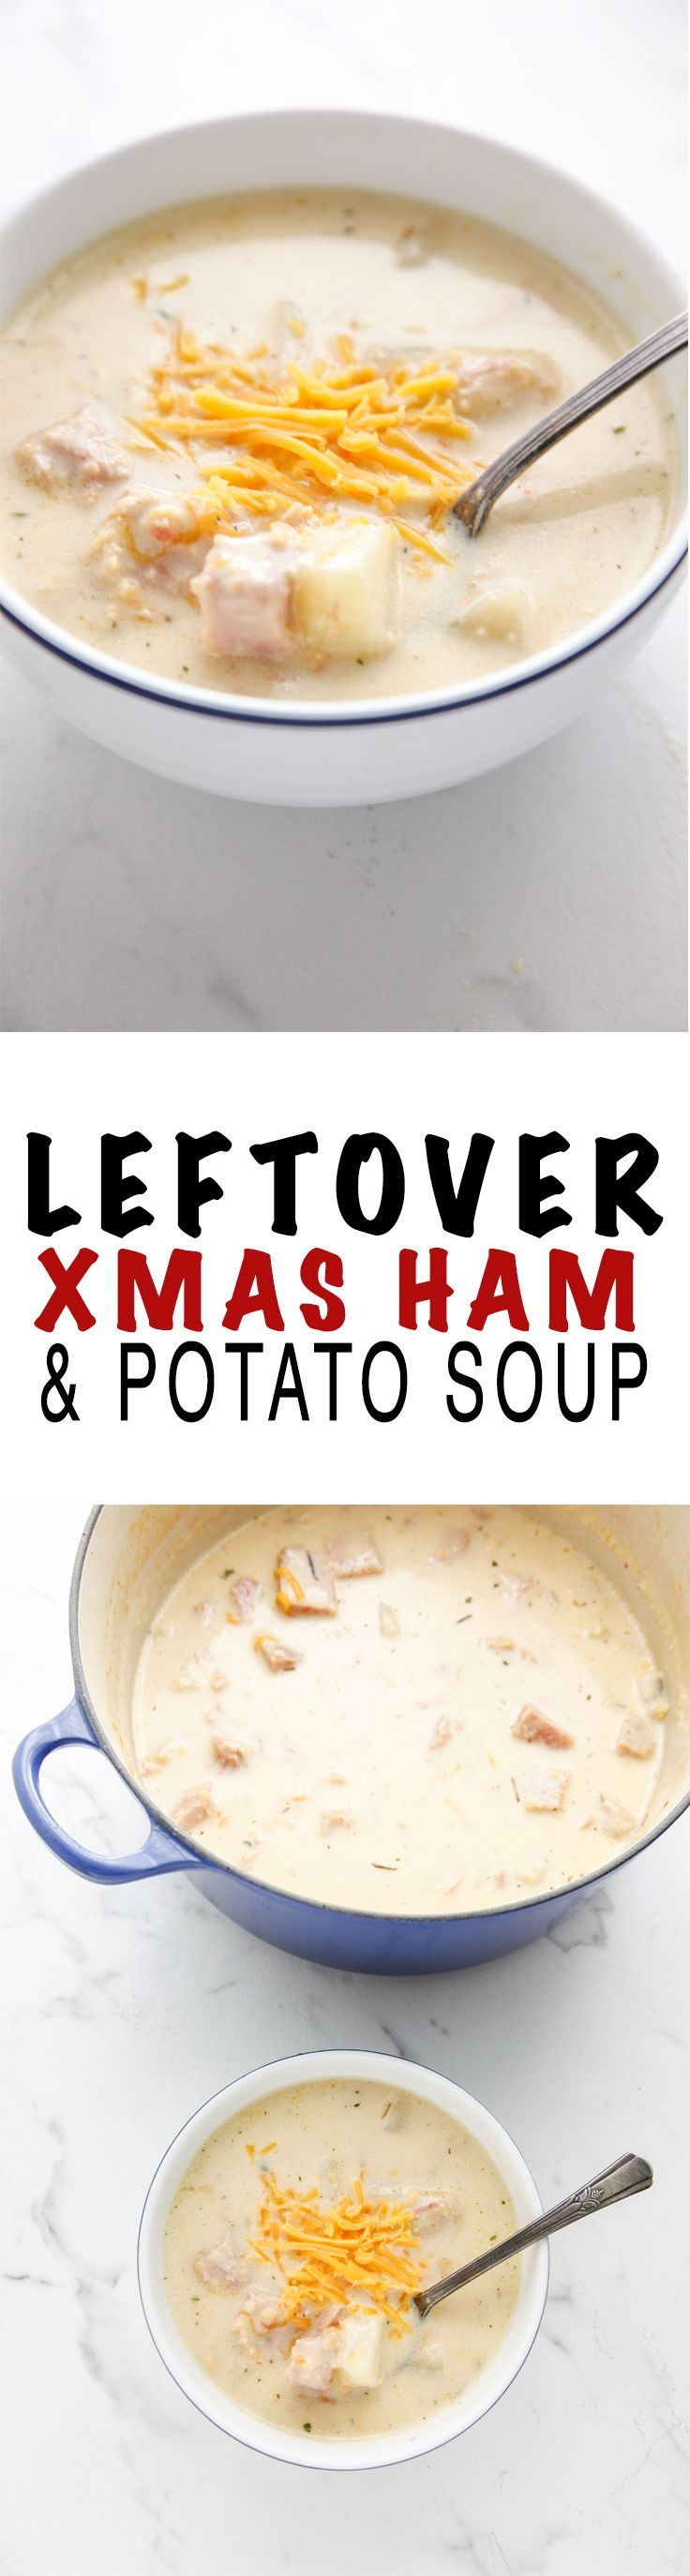 Leftover Ham and Potato Soup via @thebrooklyncook